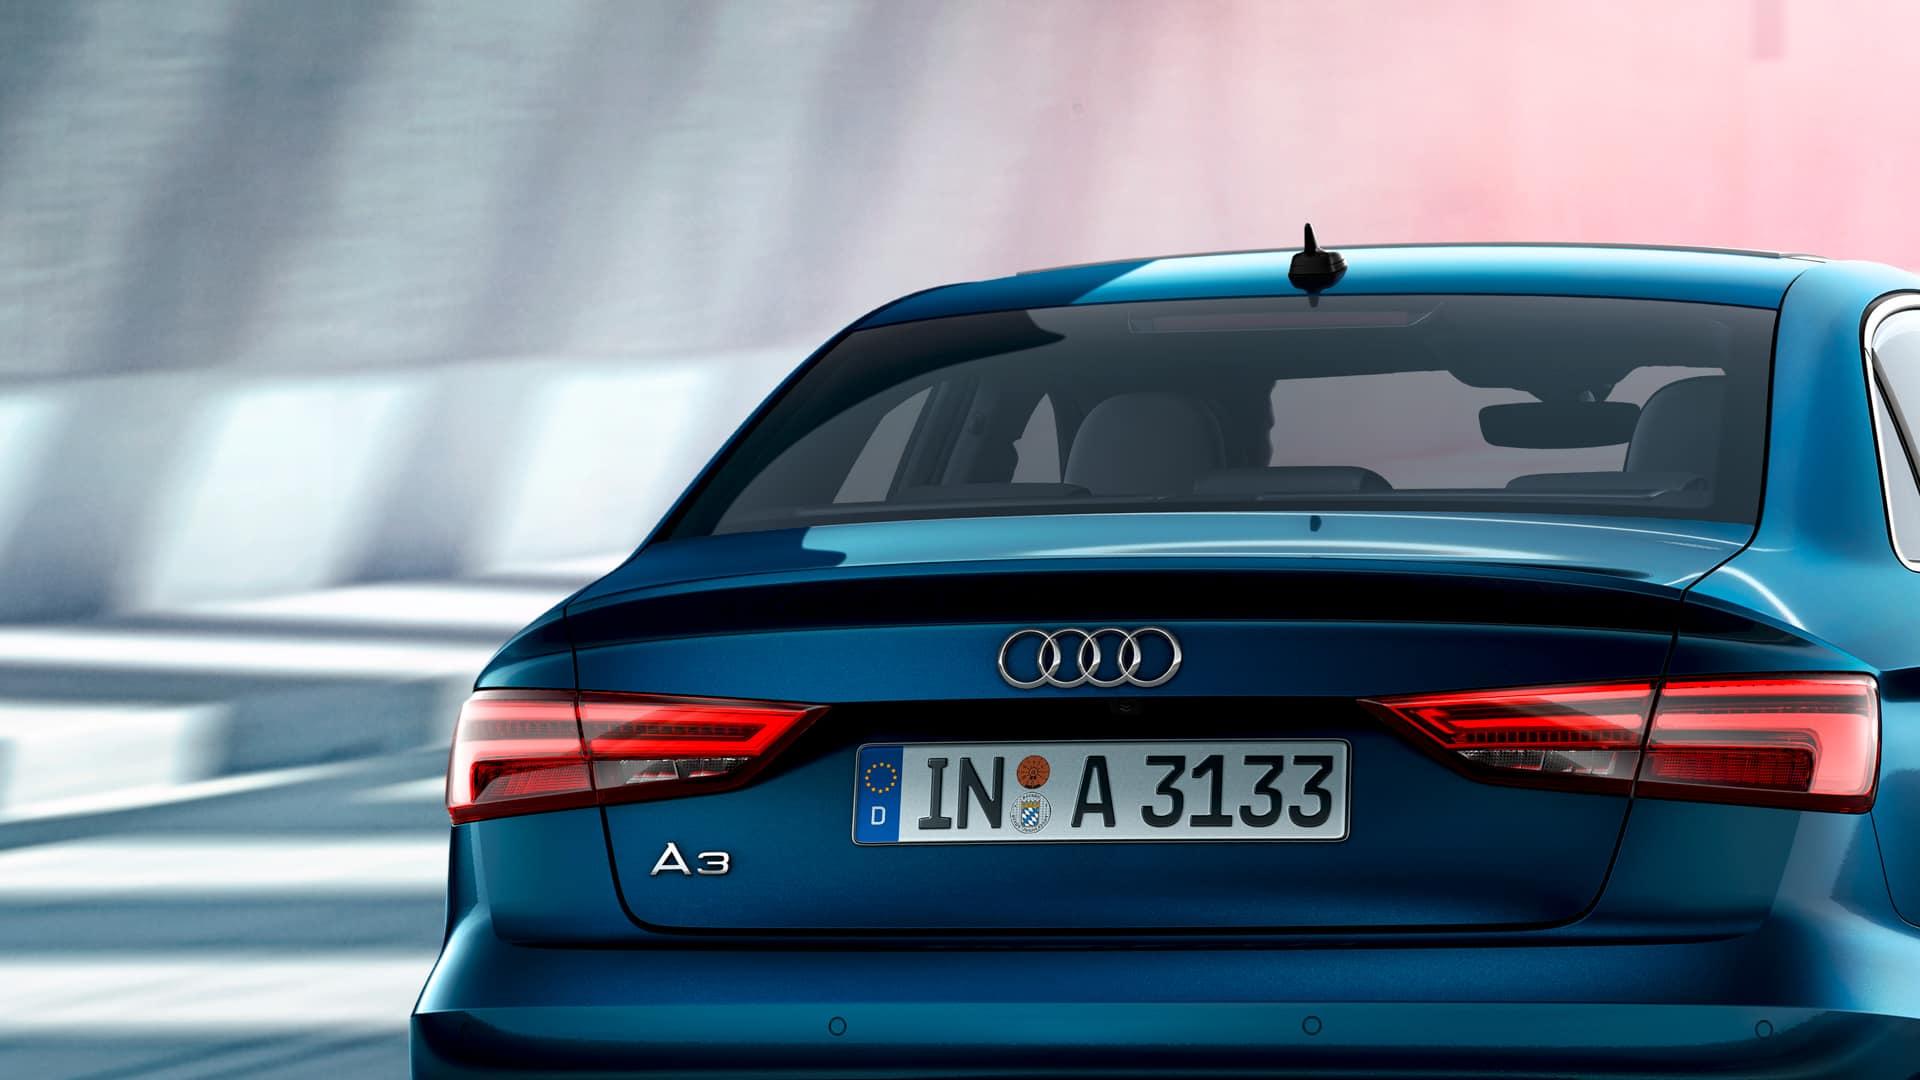 Kelebihan A3 Audi 2019 Tangguh